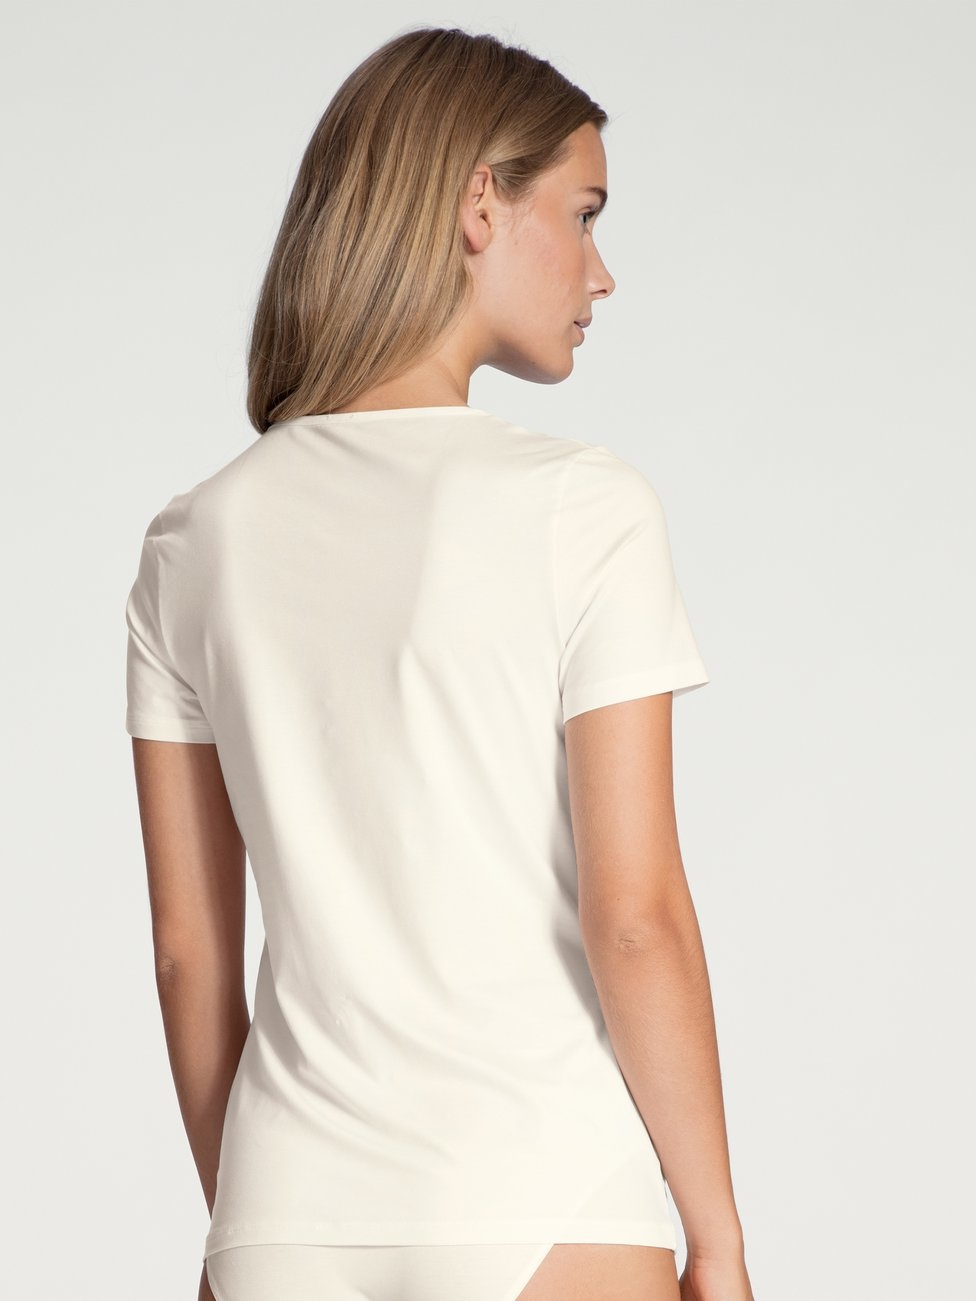 Calida T-shirt  tencel 100% compostable